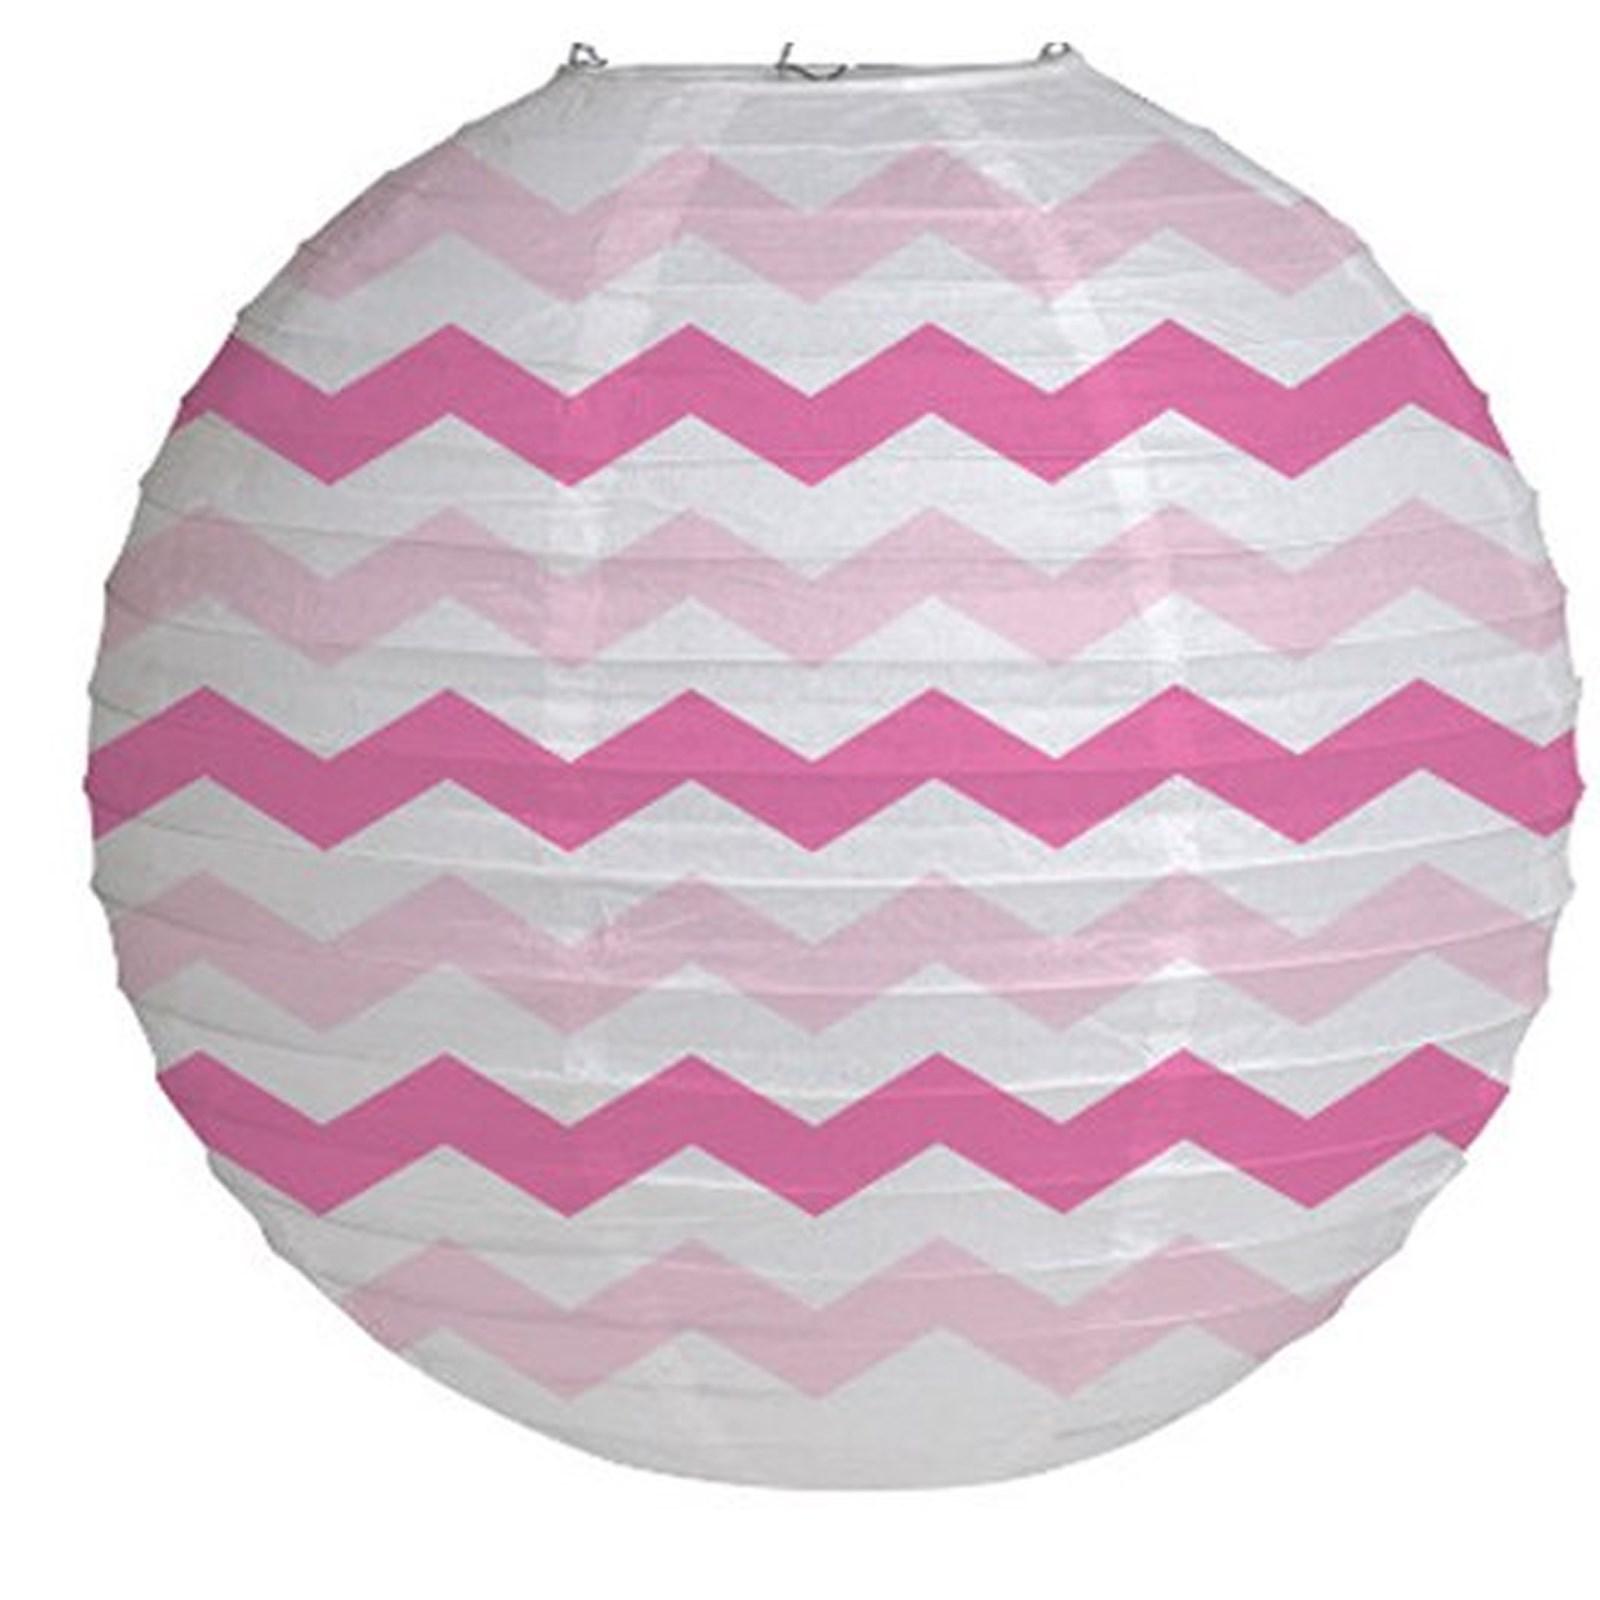 "Image of 12"" Round Paper Chevron Lantern - Candy Pink"